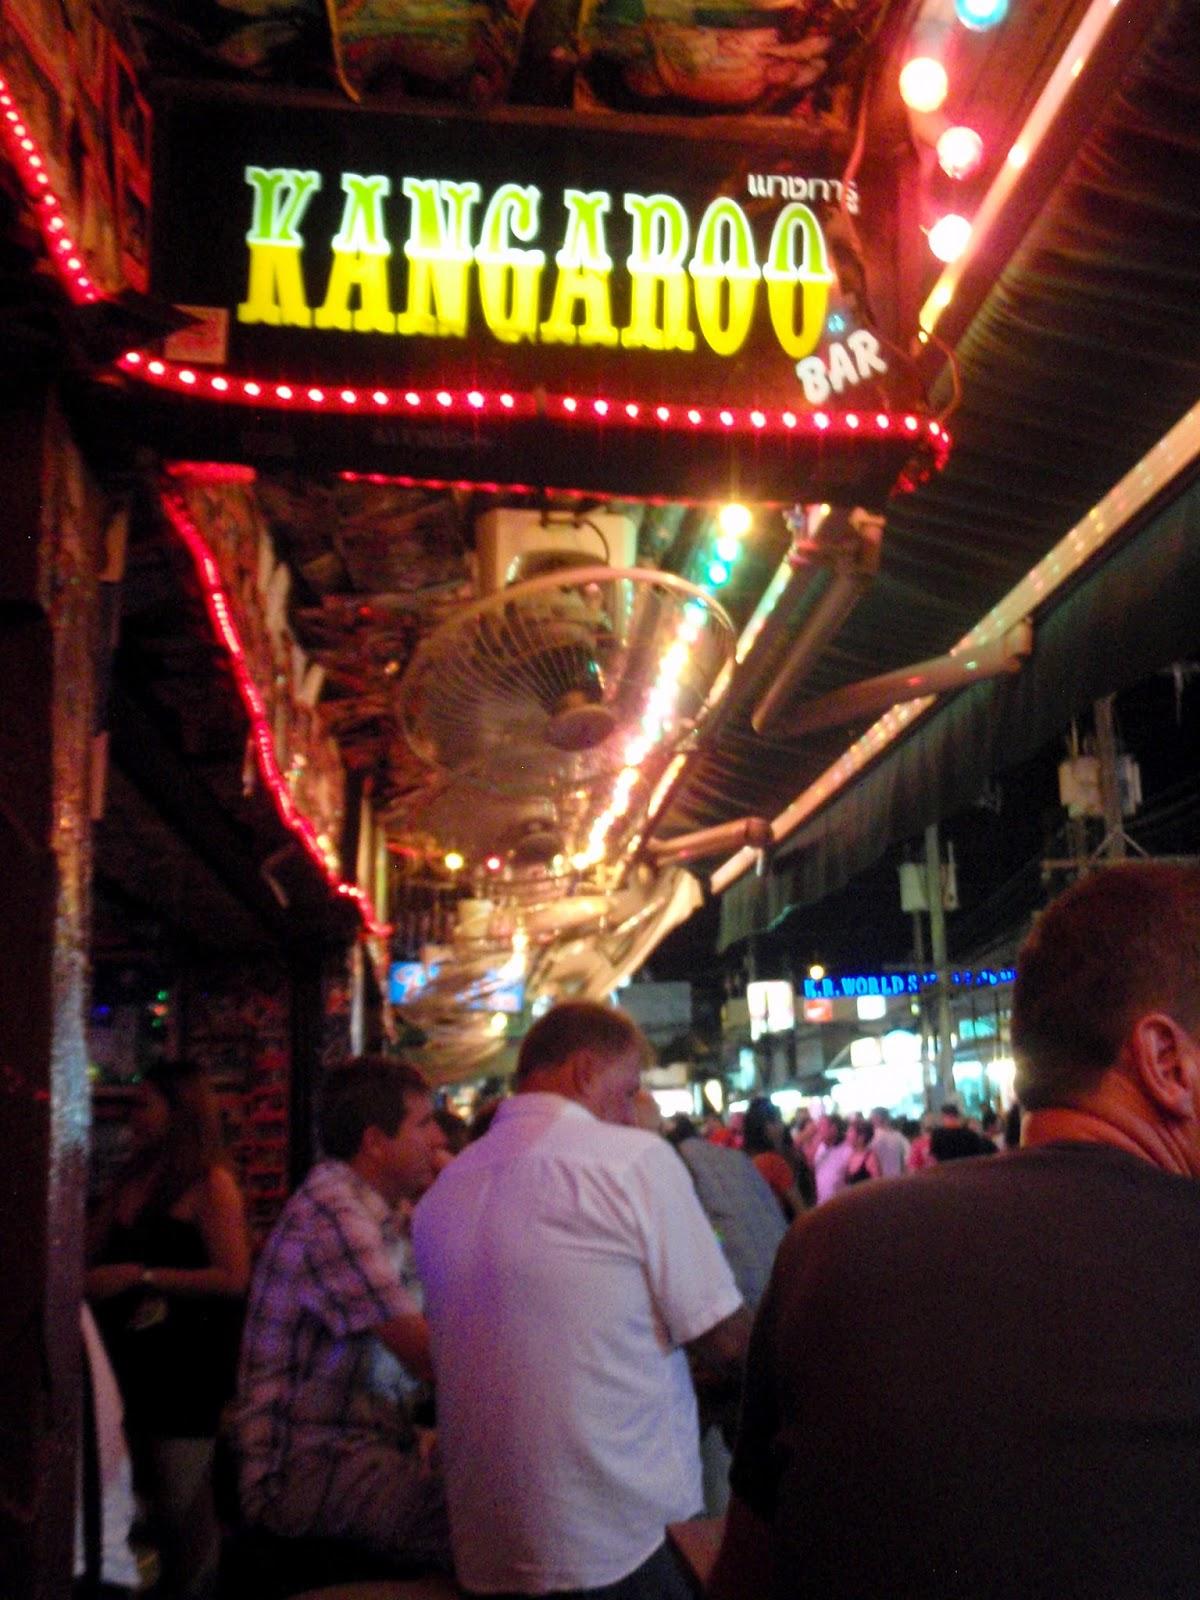 Kangaroo Bar, Bangla Road, Patong Beach, Phuket, Thailand